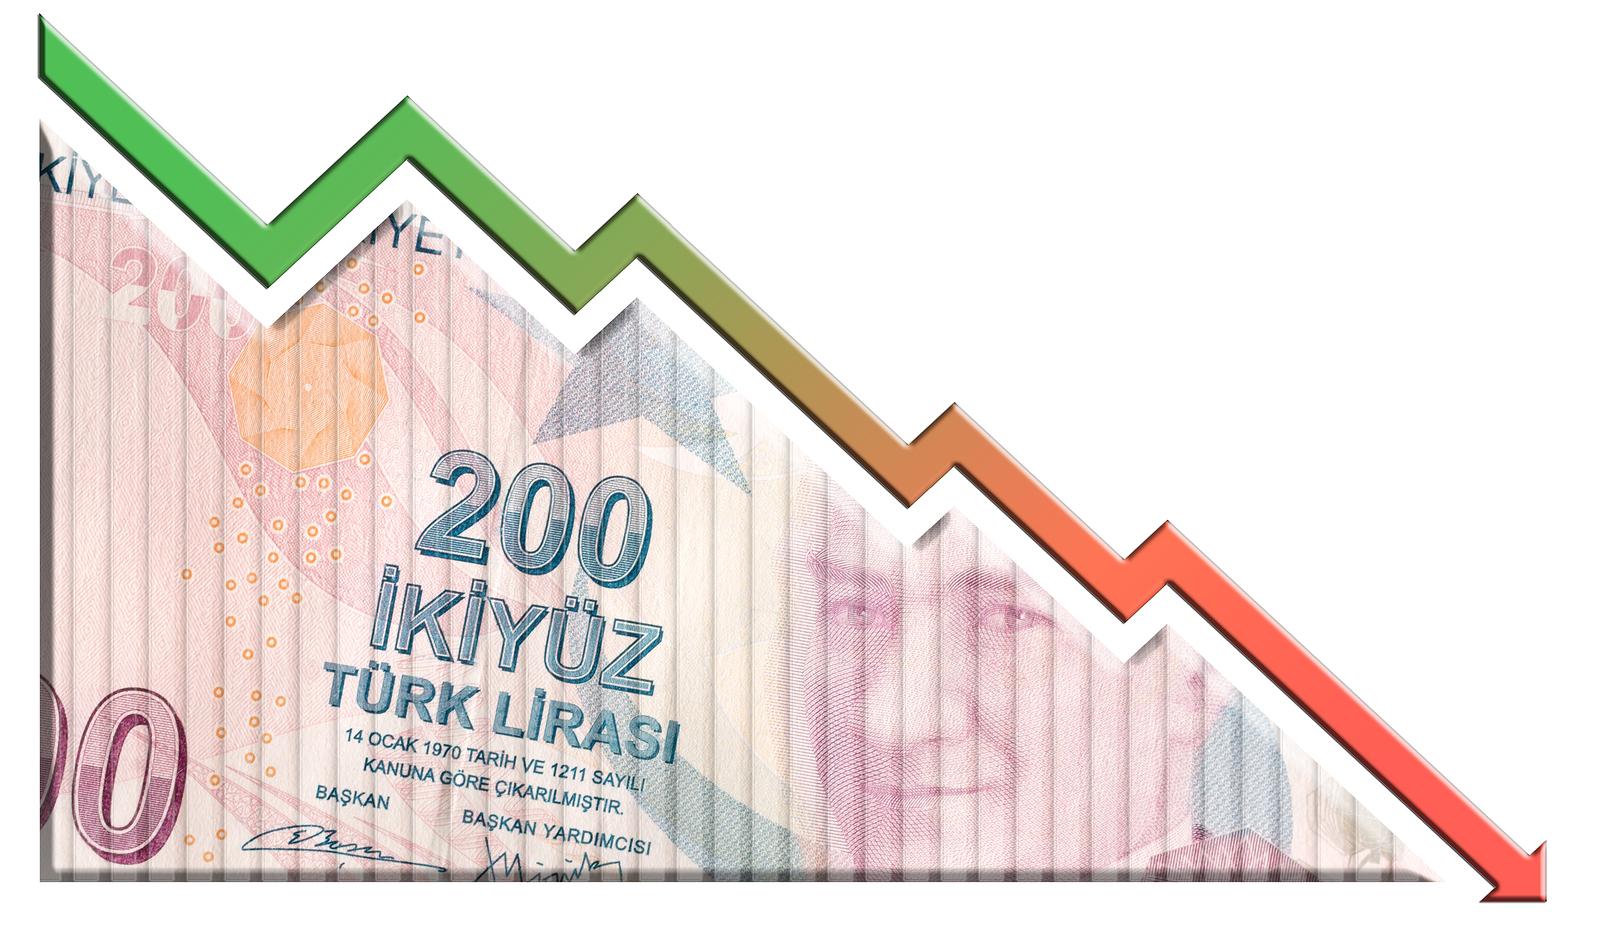 MB faiz artışı ilaç mı zehir mi? | Murat Kubilay